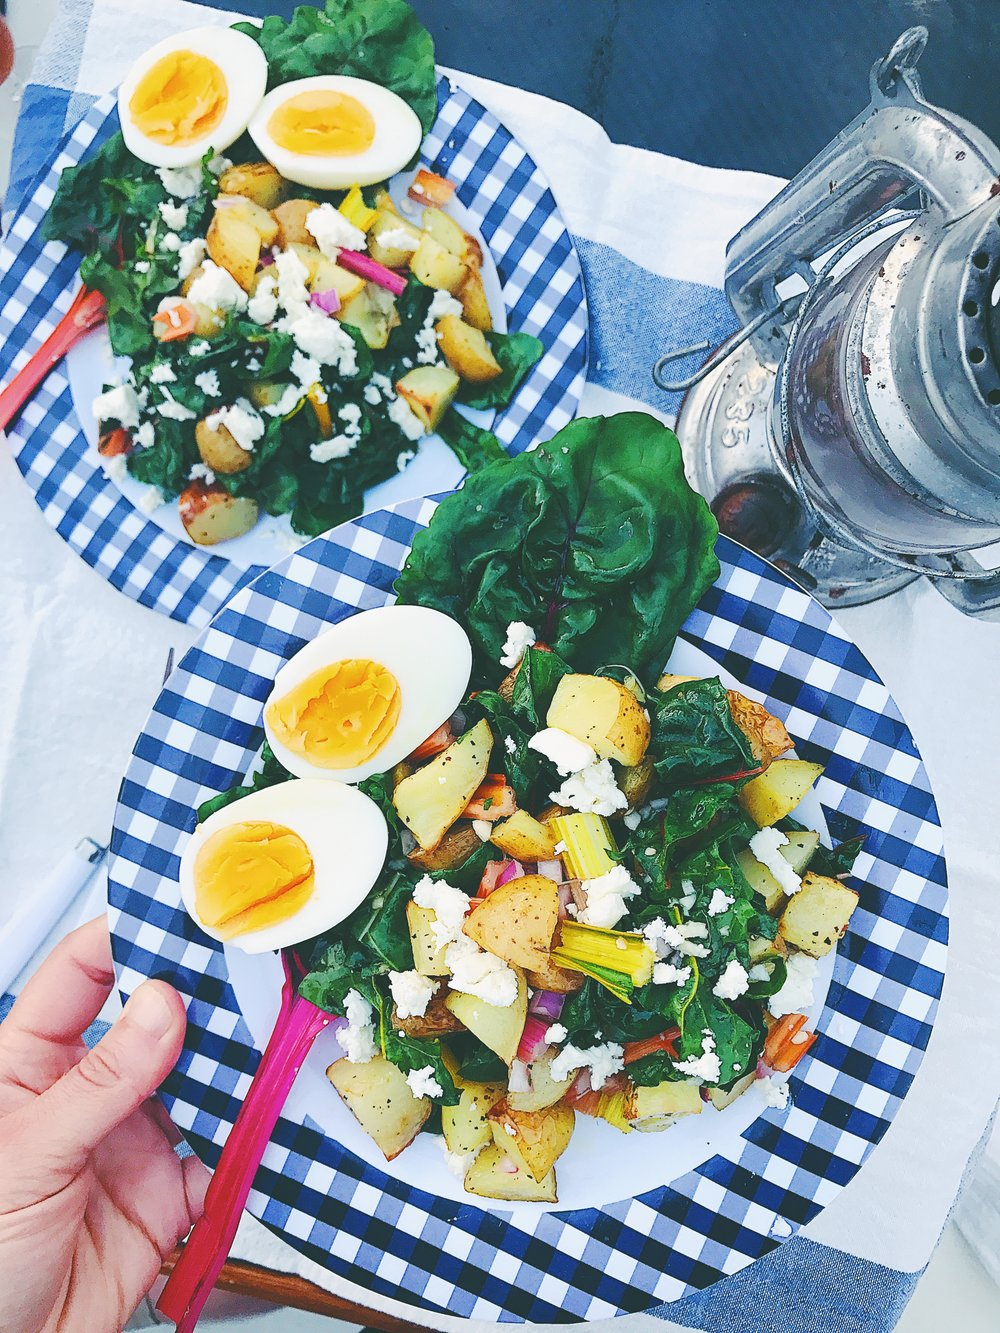 Recipe: Swedish Potato Salad with Feta Cheese